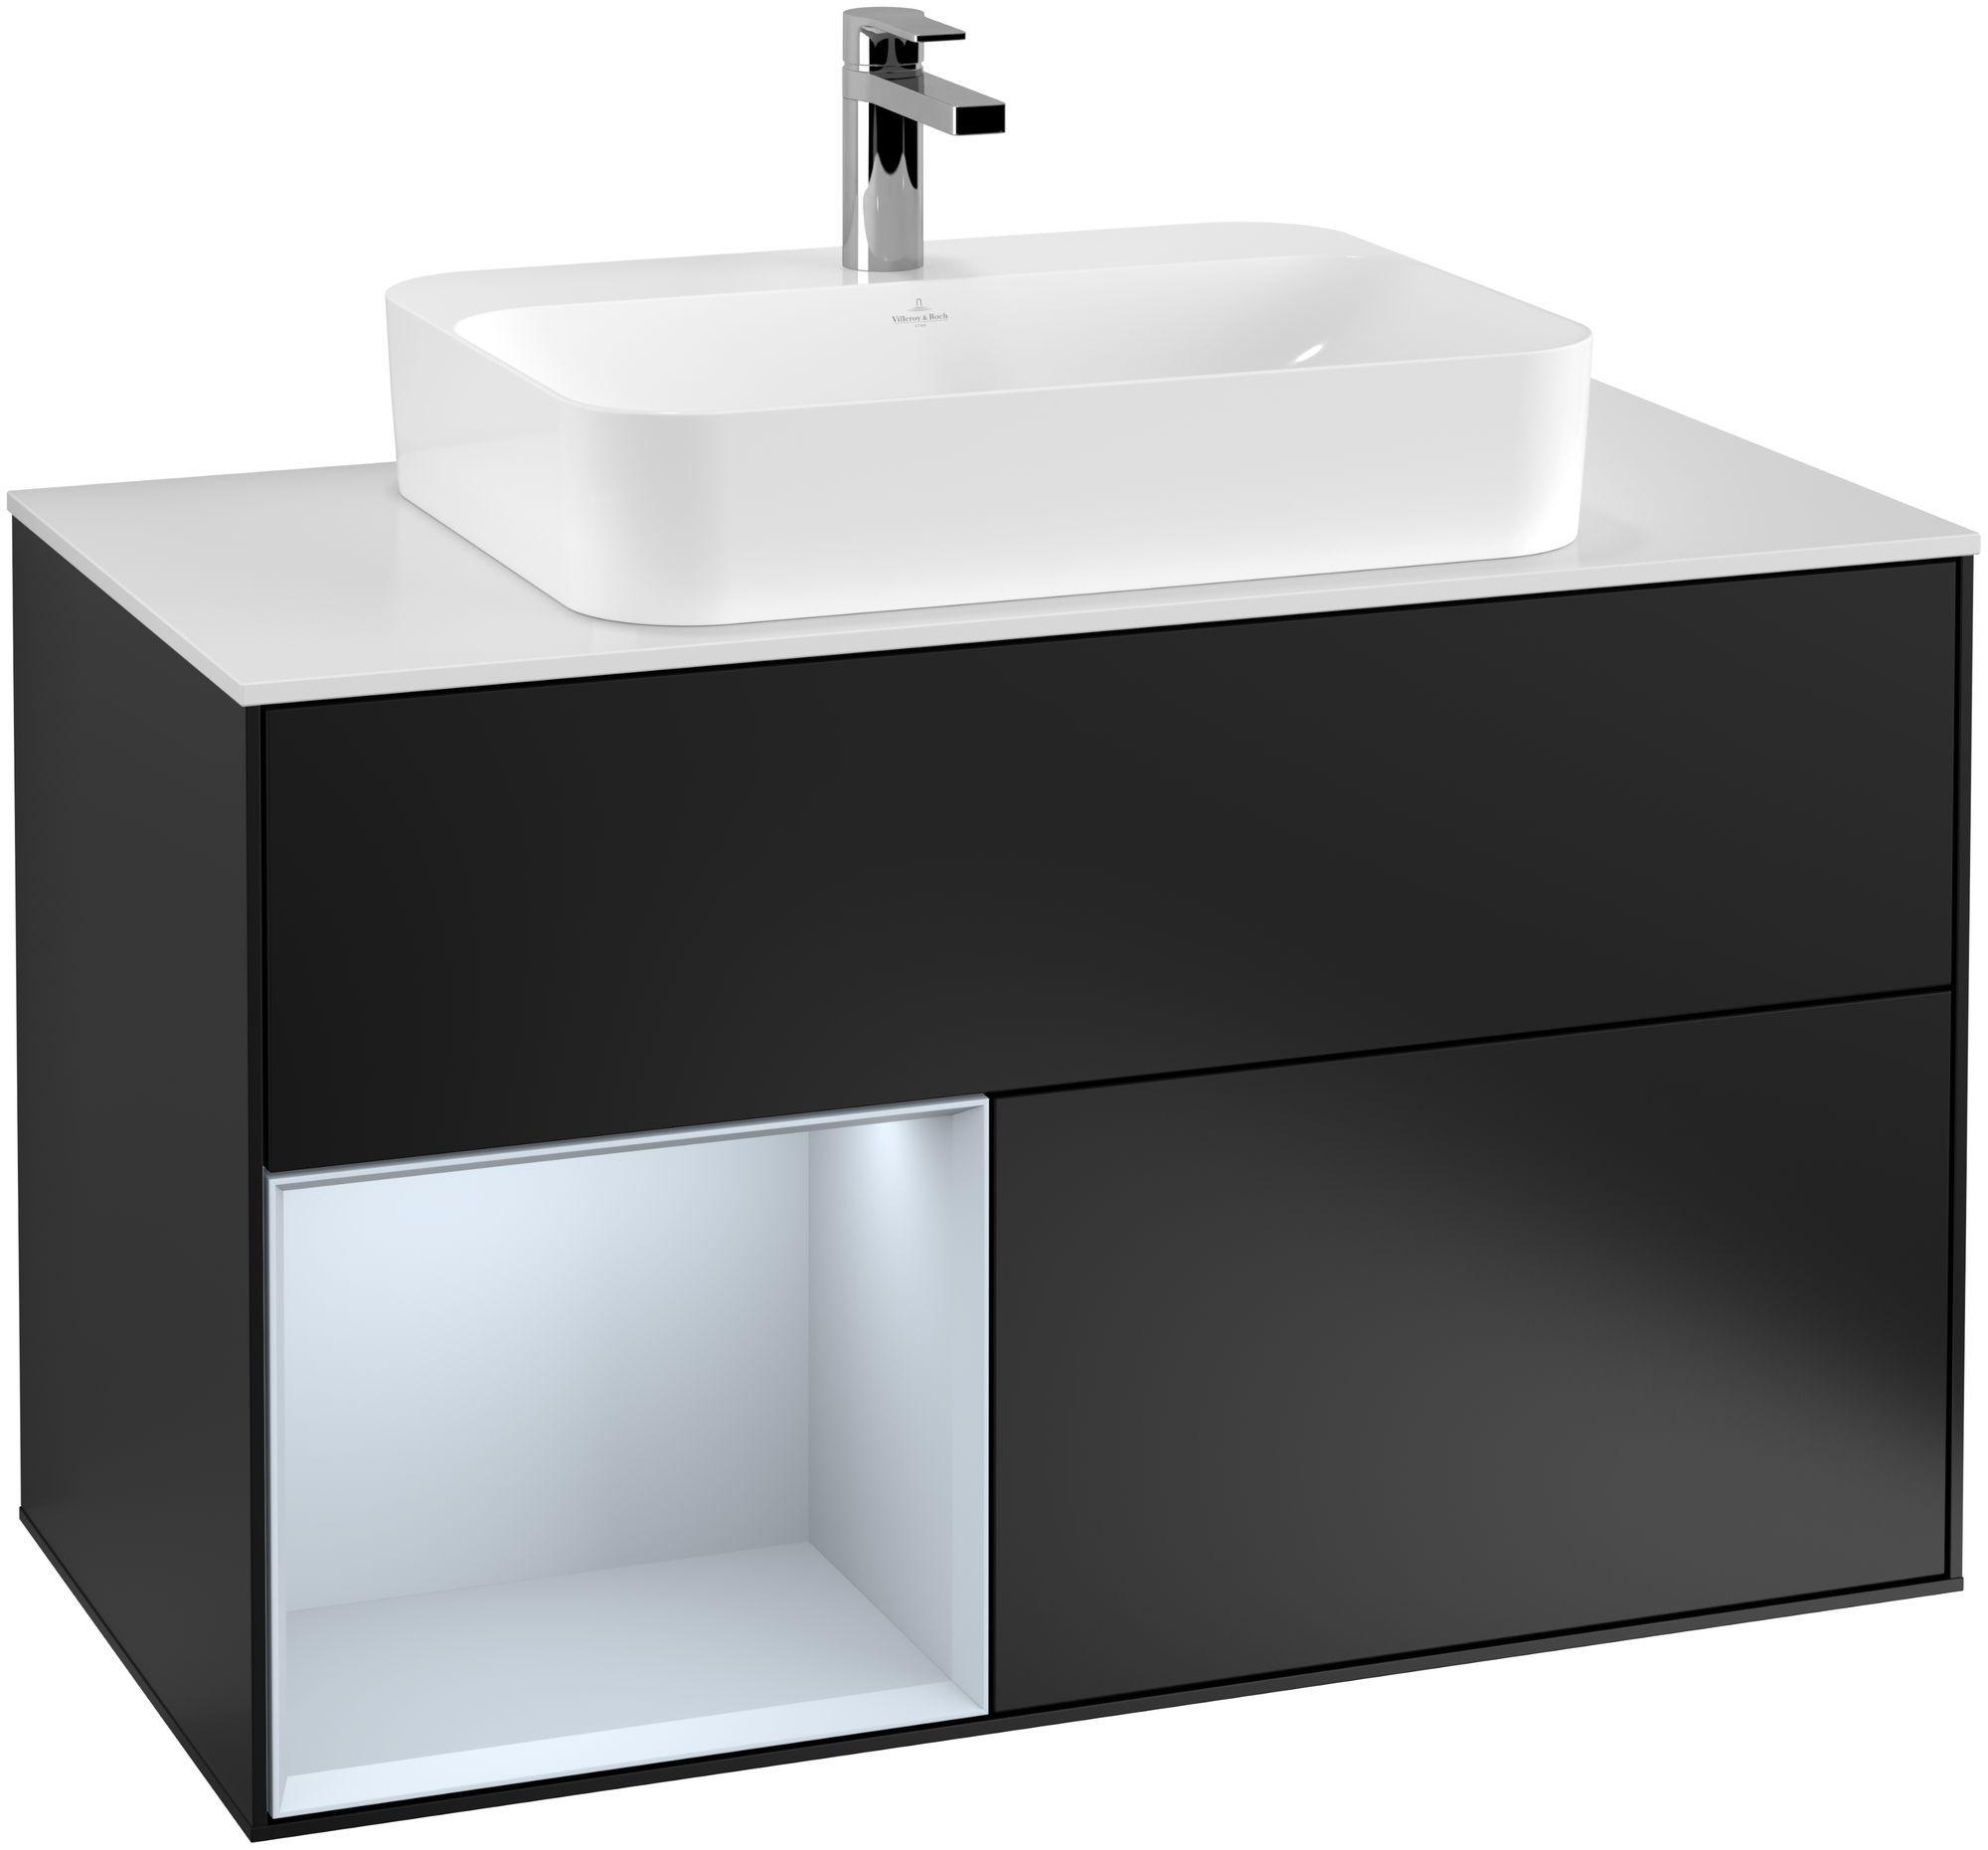 Villeroy & Boch Finion G36 Waschtischunterschrank mit Regalelement 2 Auszüge Waschtisch mittig LED-Beleuchtung B:100xH:60,3xT:50,1cm Front, Korpus: Black Matt Lacquer, Regal: Cloud, Glasplatte: White Matt G361HAPD